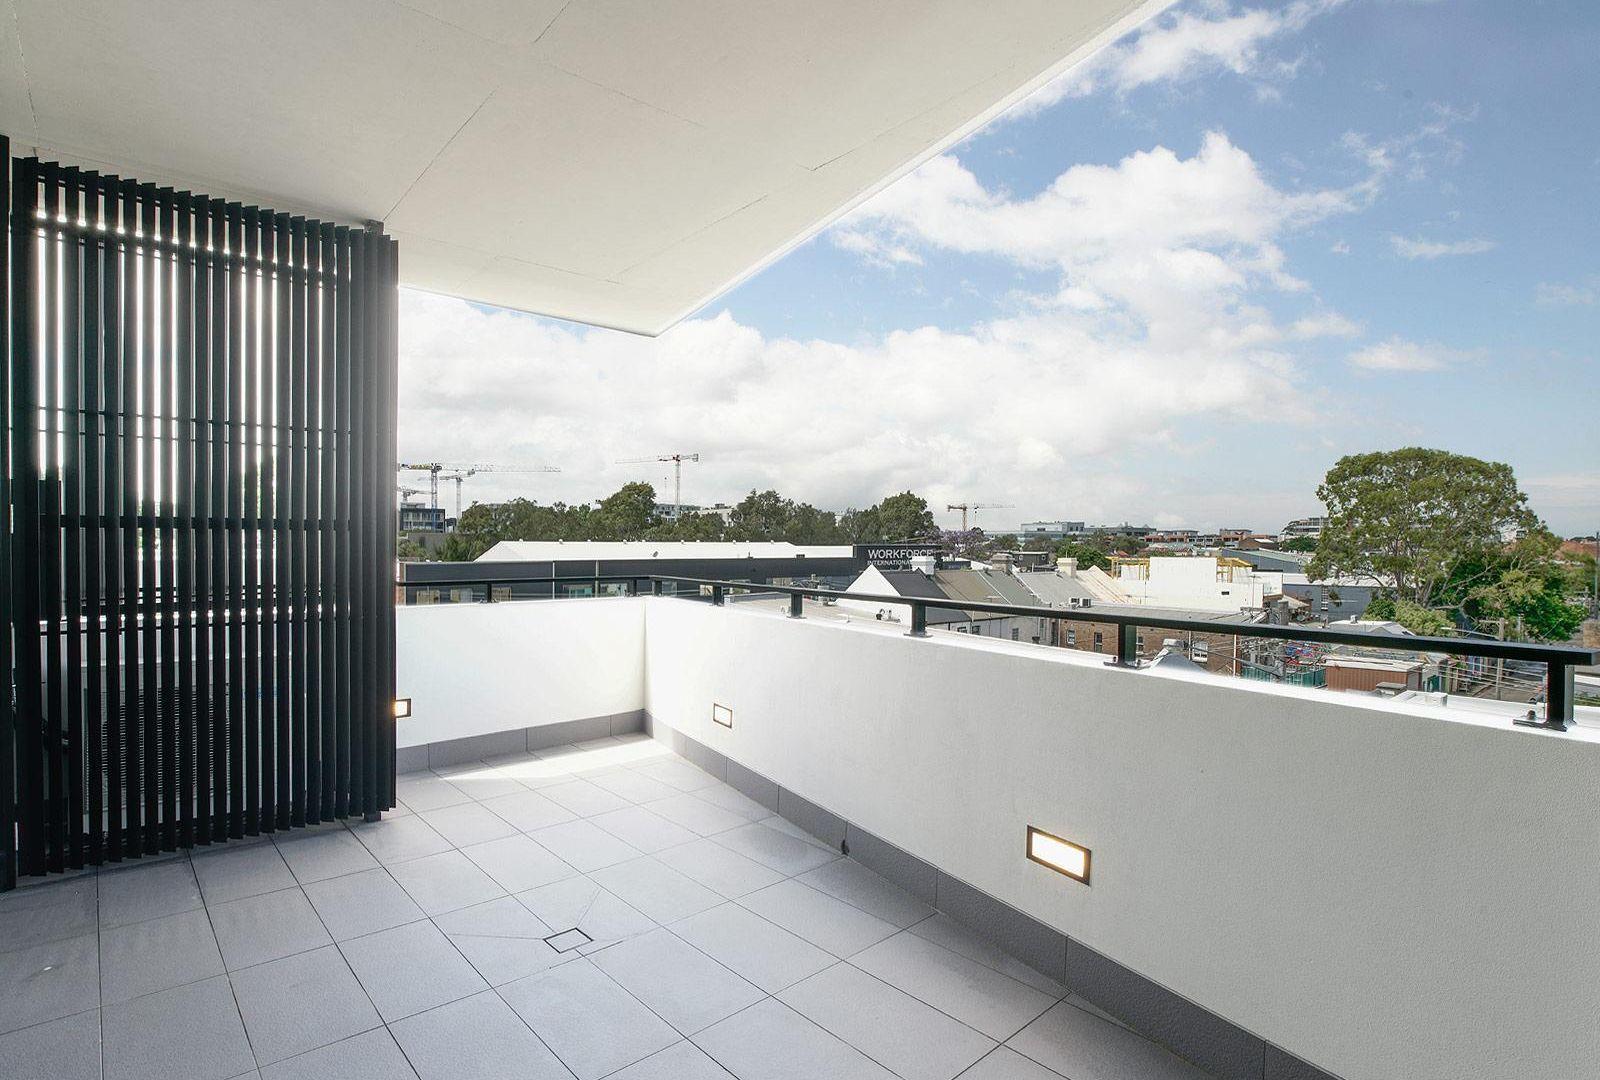 206/63 Victoria Avenue, Beaconsfield NSW 2015, Image 4